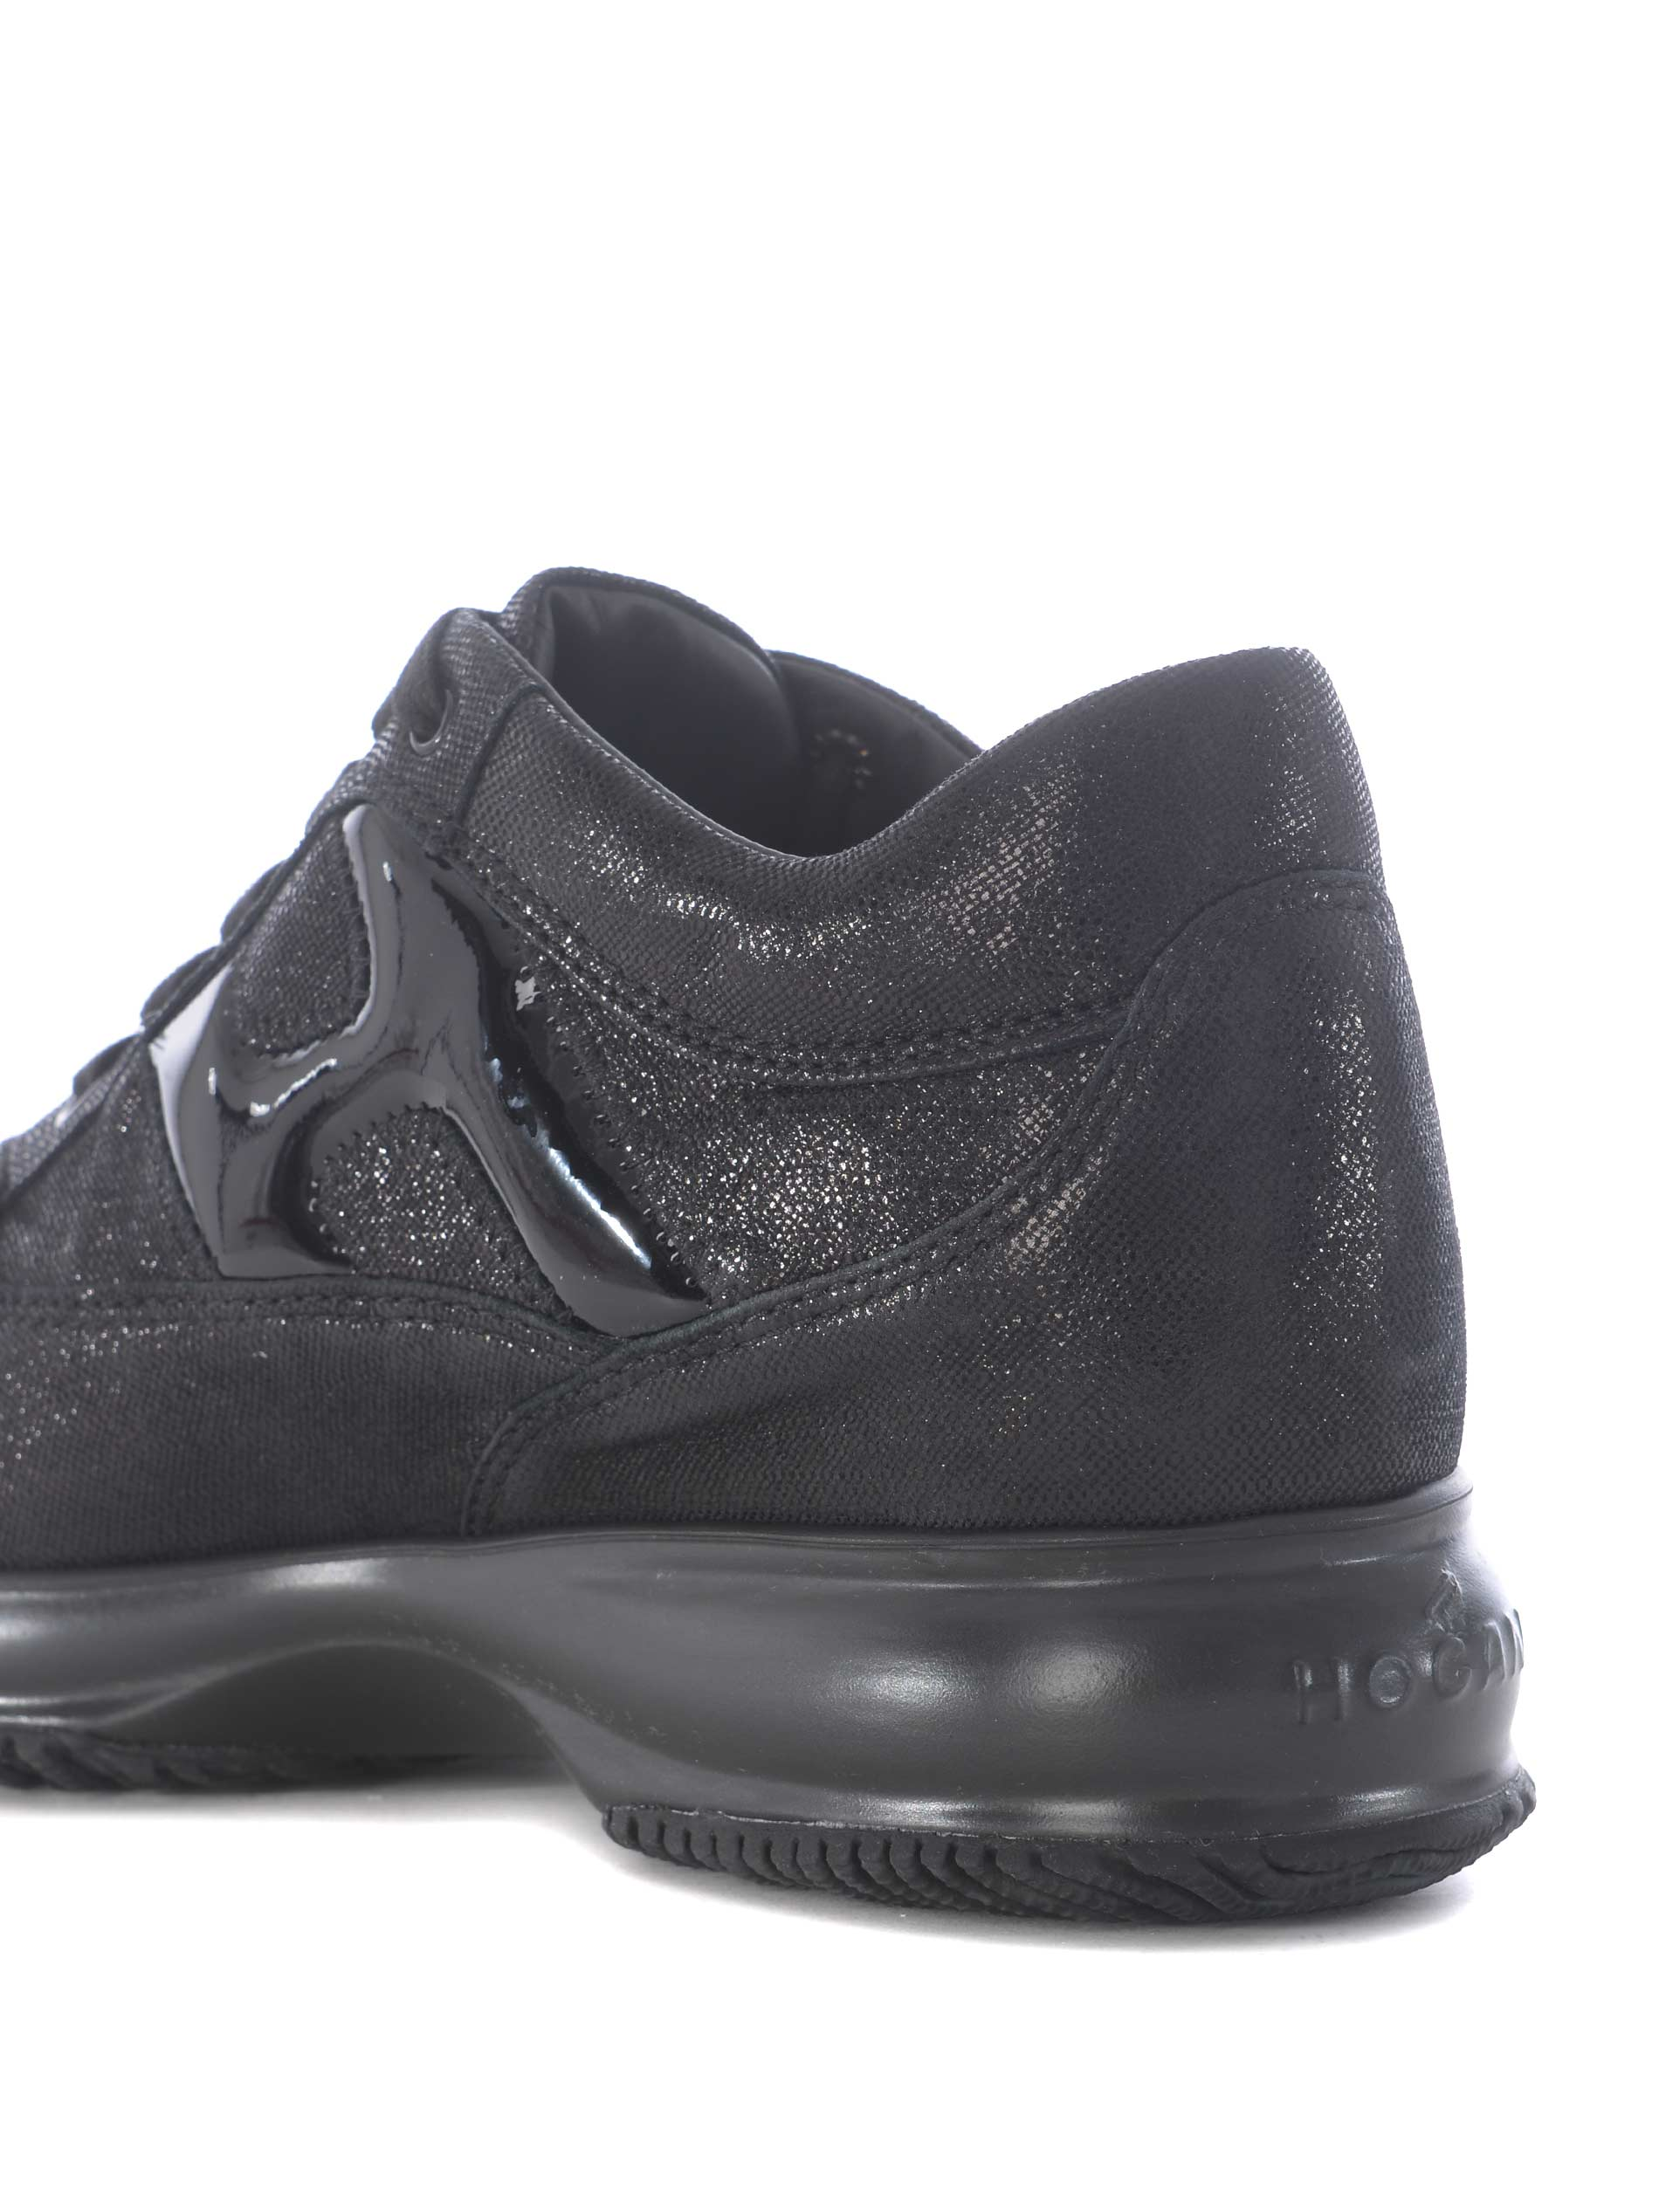 Sneakers donna Hogan Interactive in glitter - HOGAN - TufanoModa